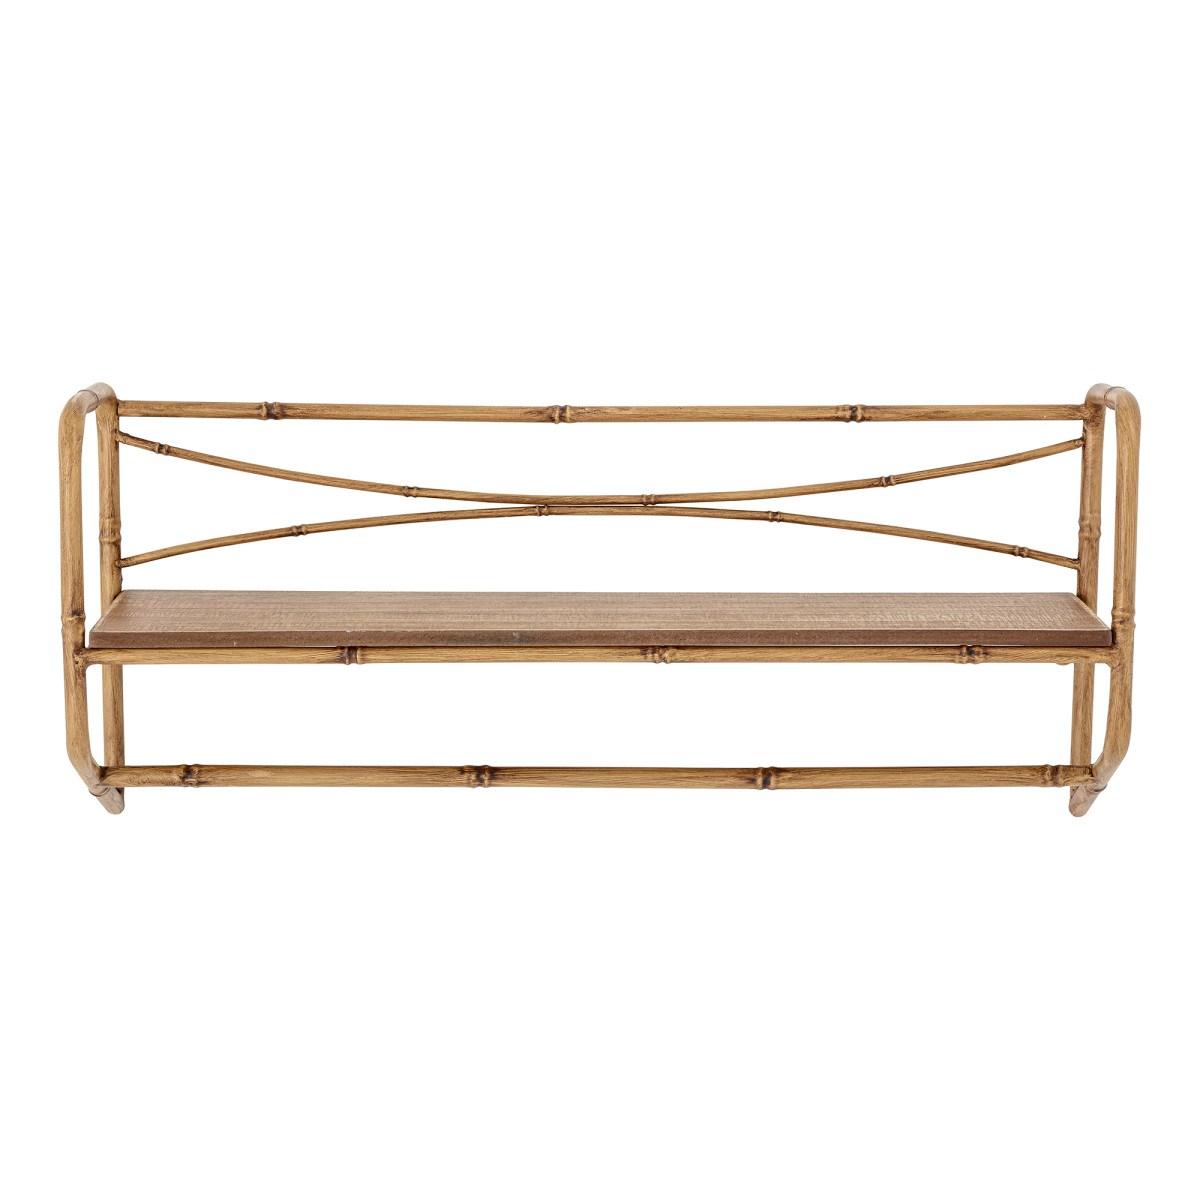 Polička Katja bambus/dřevo 63 cm_2